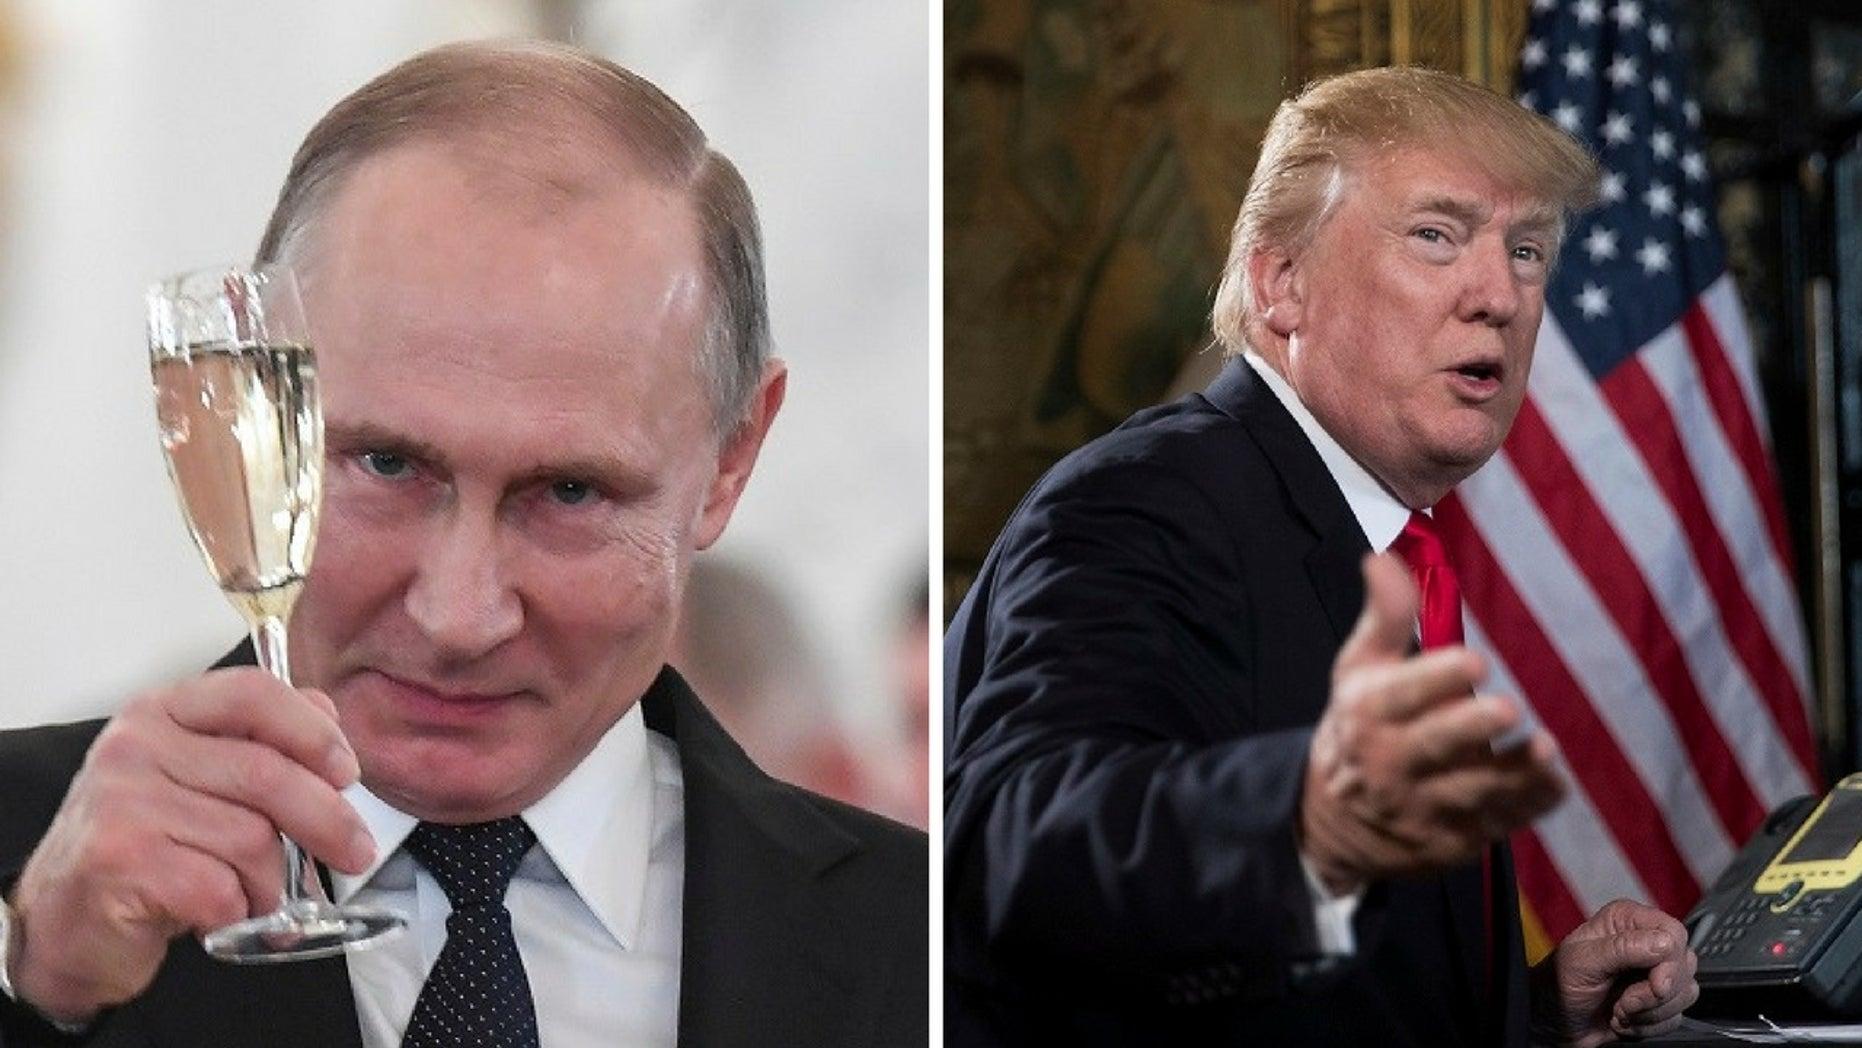 Russian President Vladimir Putin sent President Trump a holiday telegram.